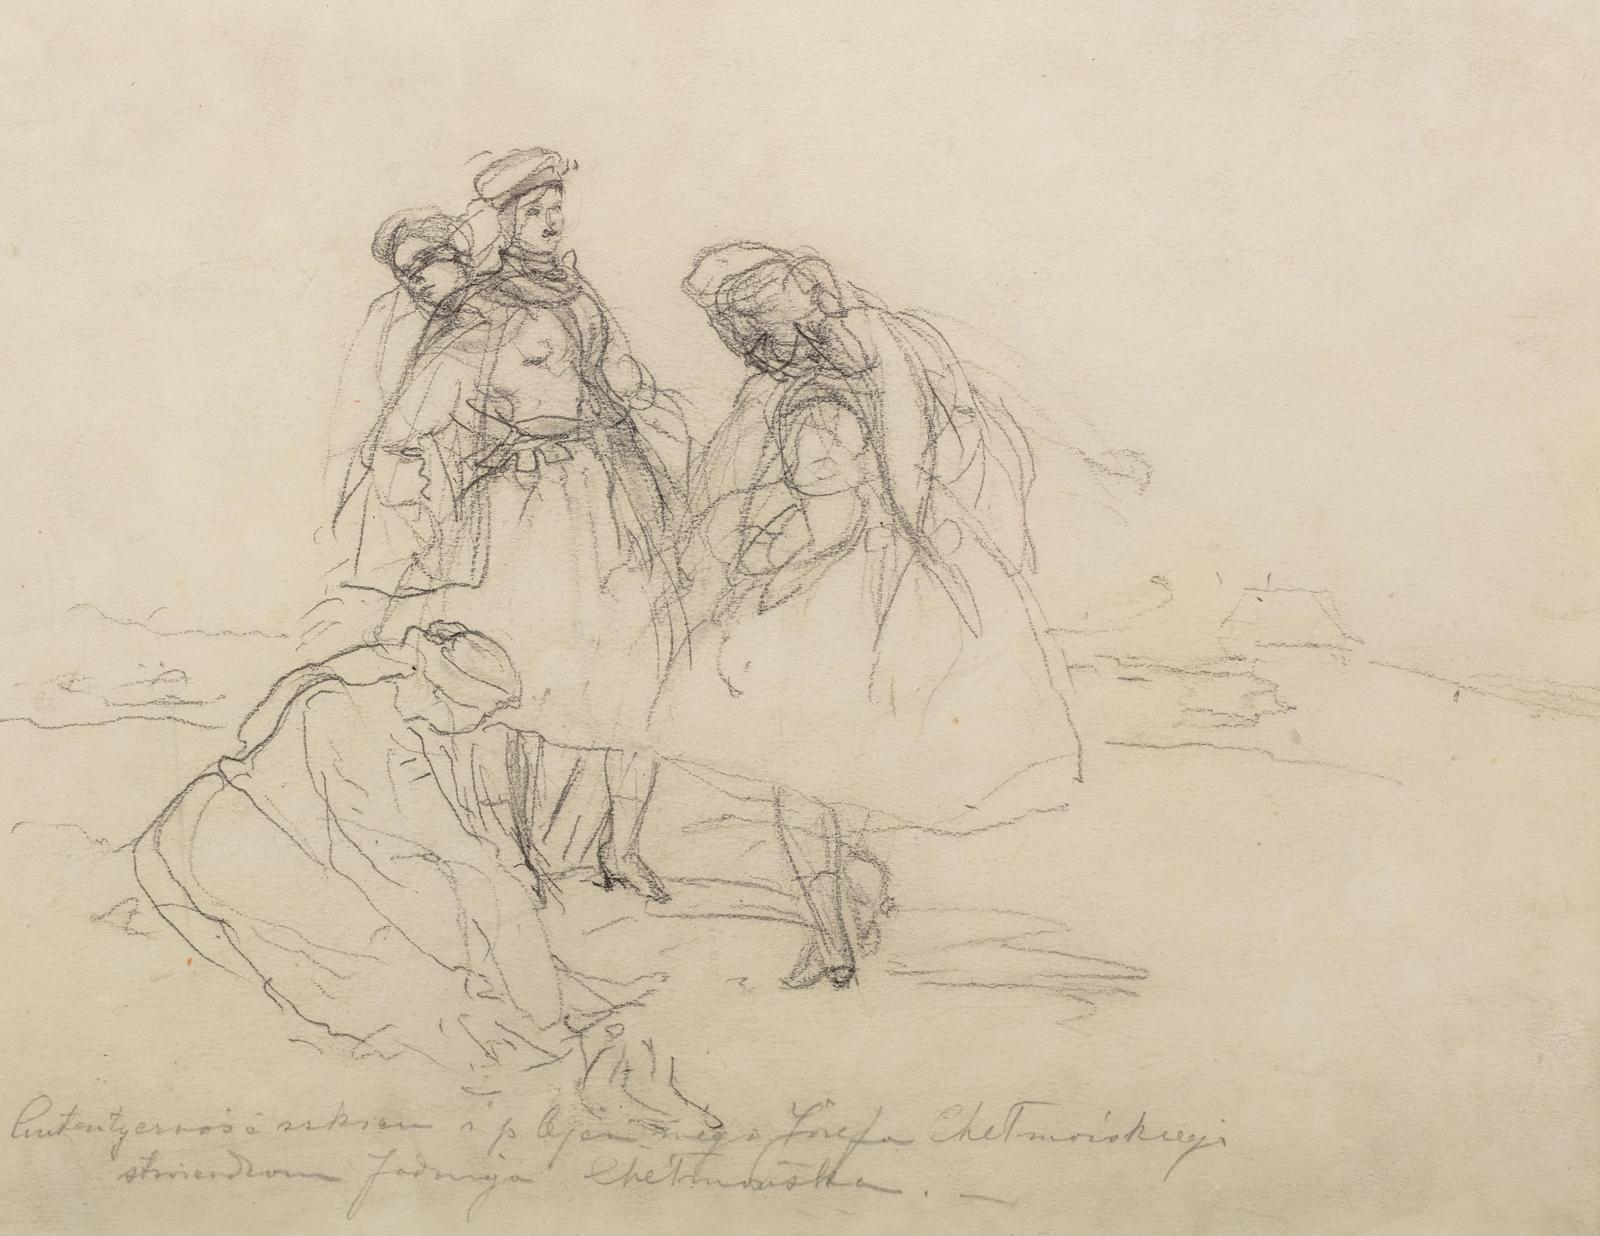 Józef Chełmoński | Studium kobiet